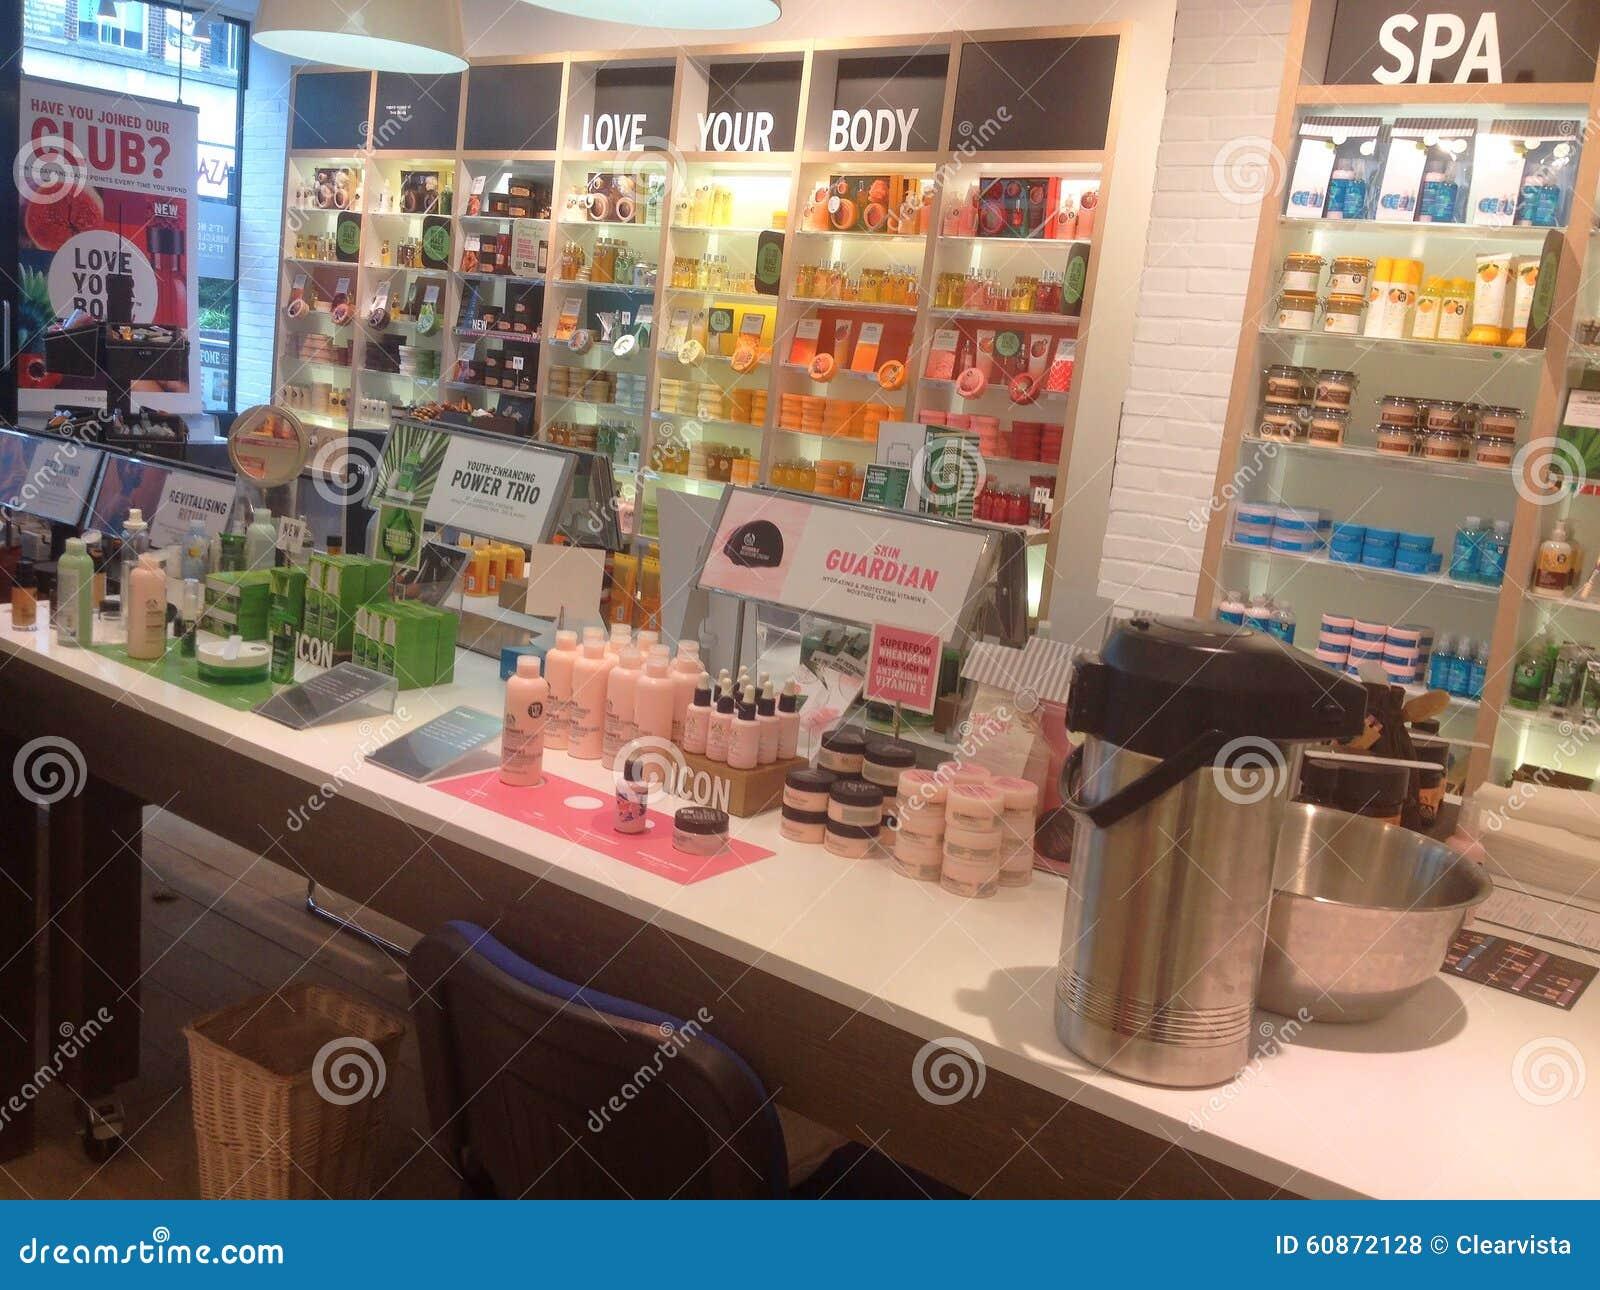 9a90e3df4 Body Shop Interior. Cosmetics And Perfumes. Editorial Stock Photo ...